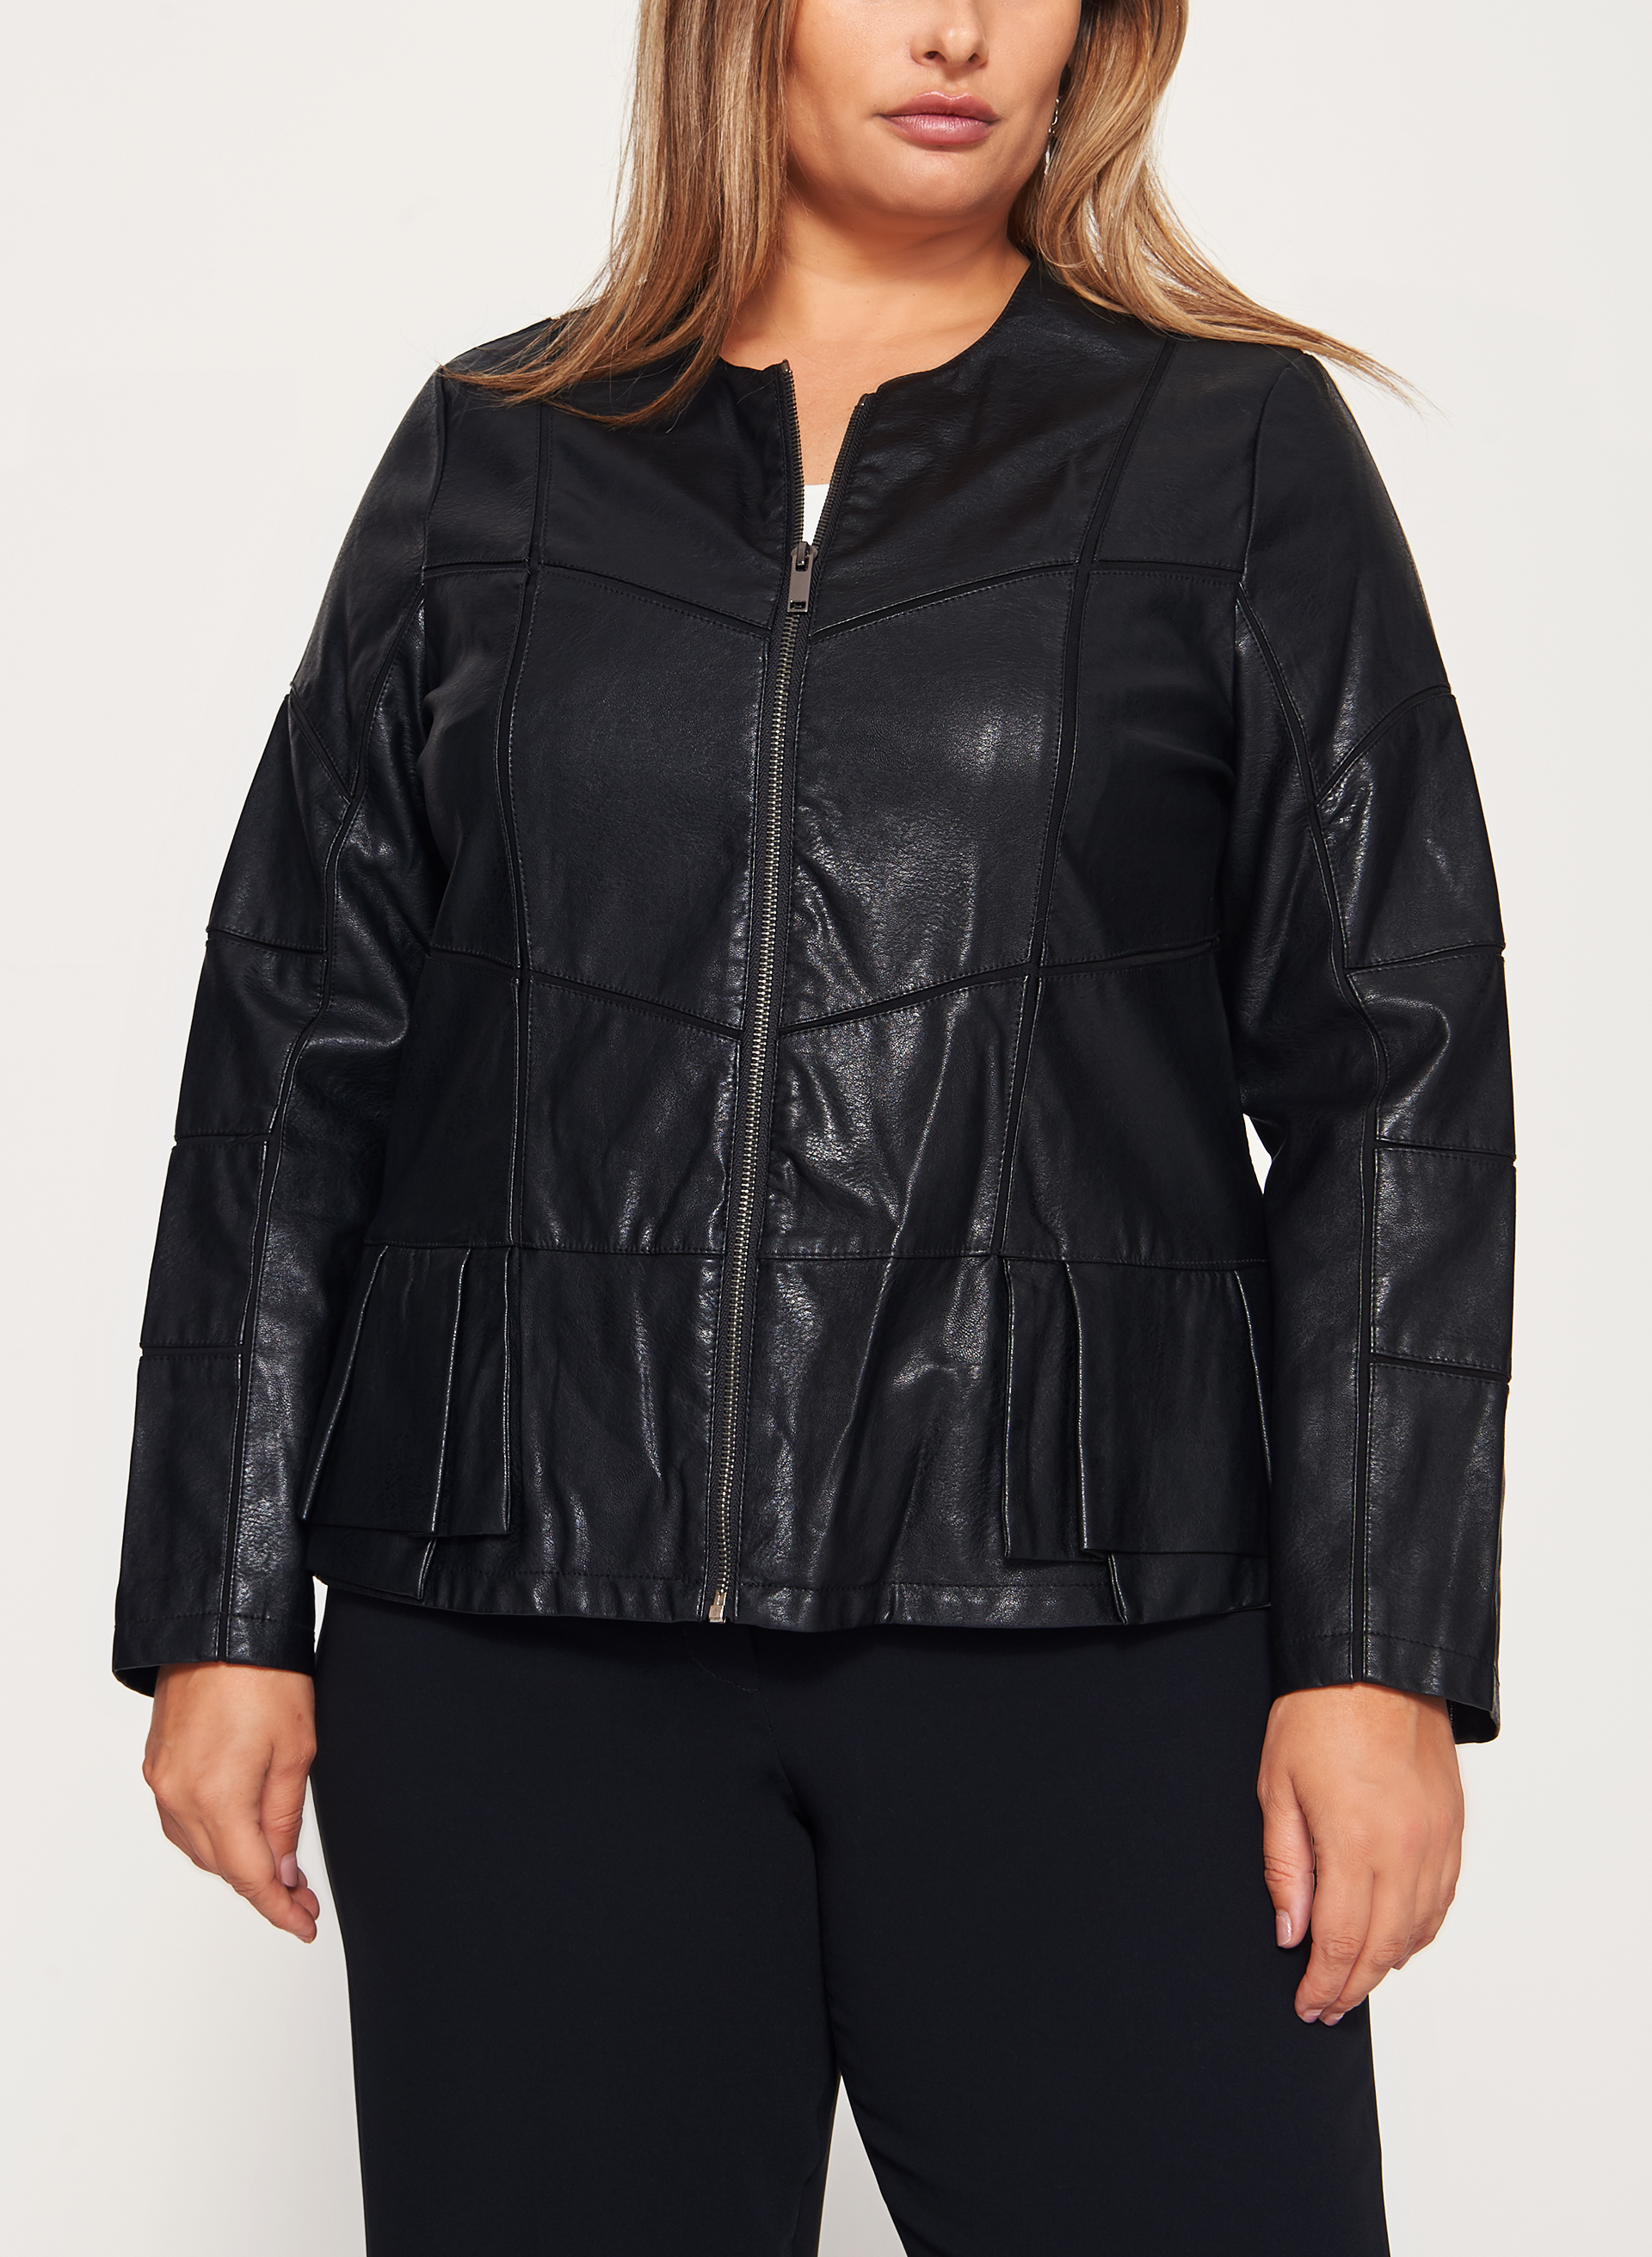 Peplum Detail Faux Leather Jacket | Laura